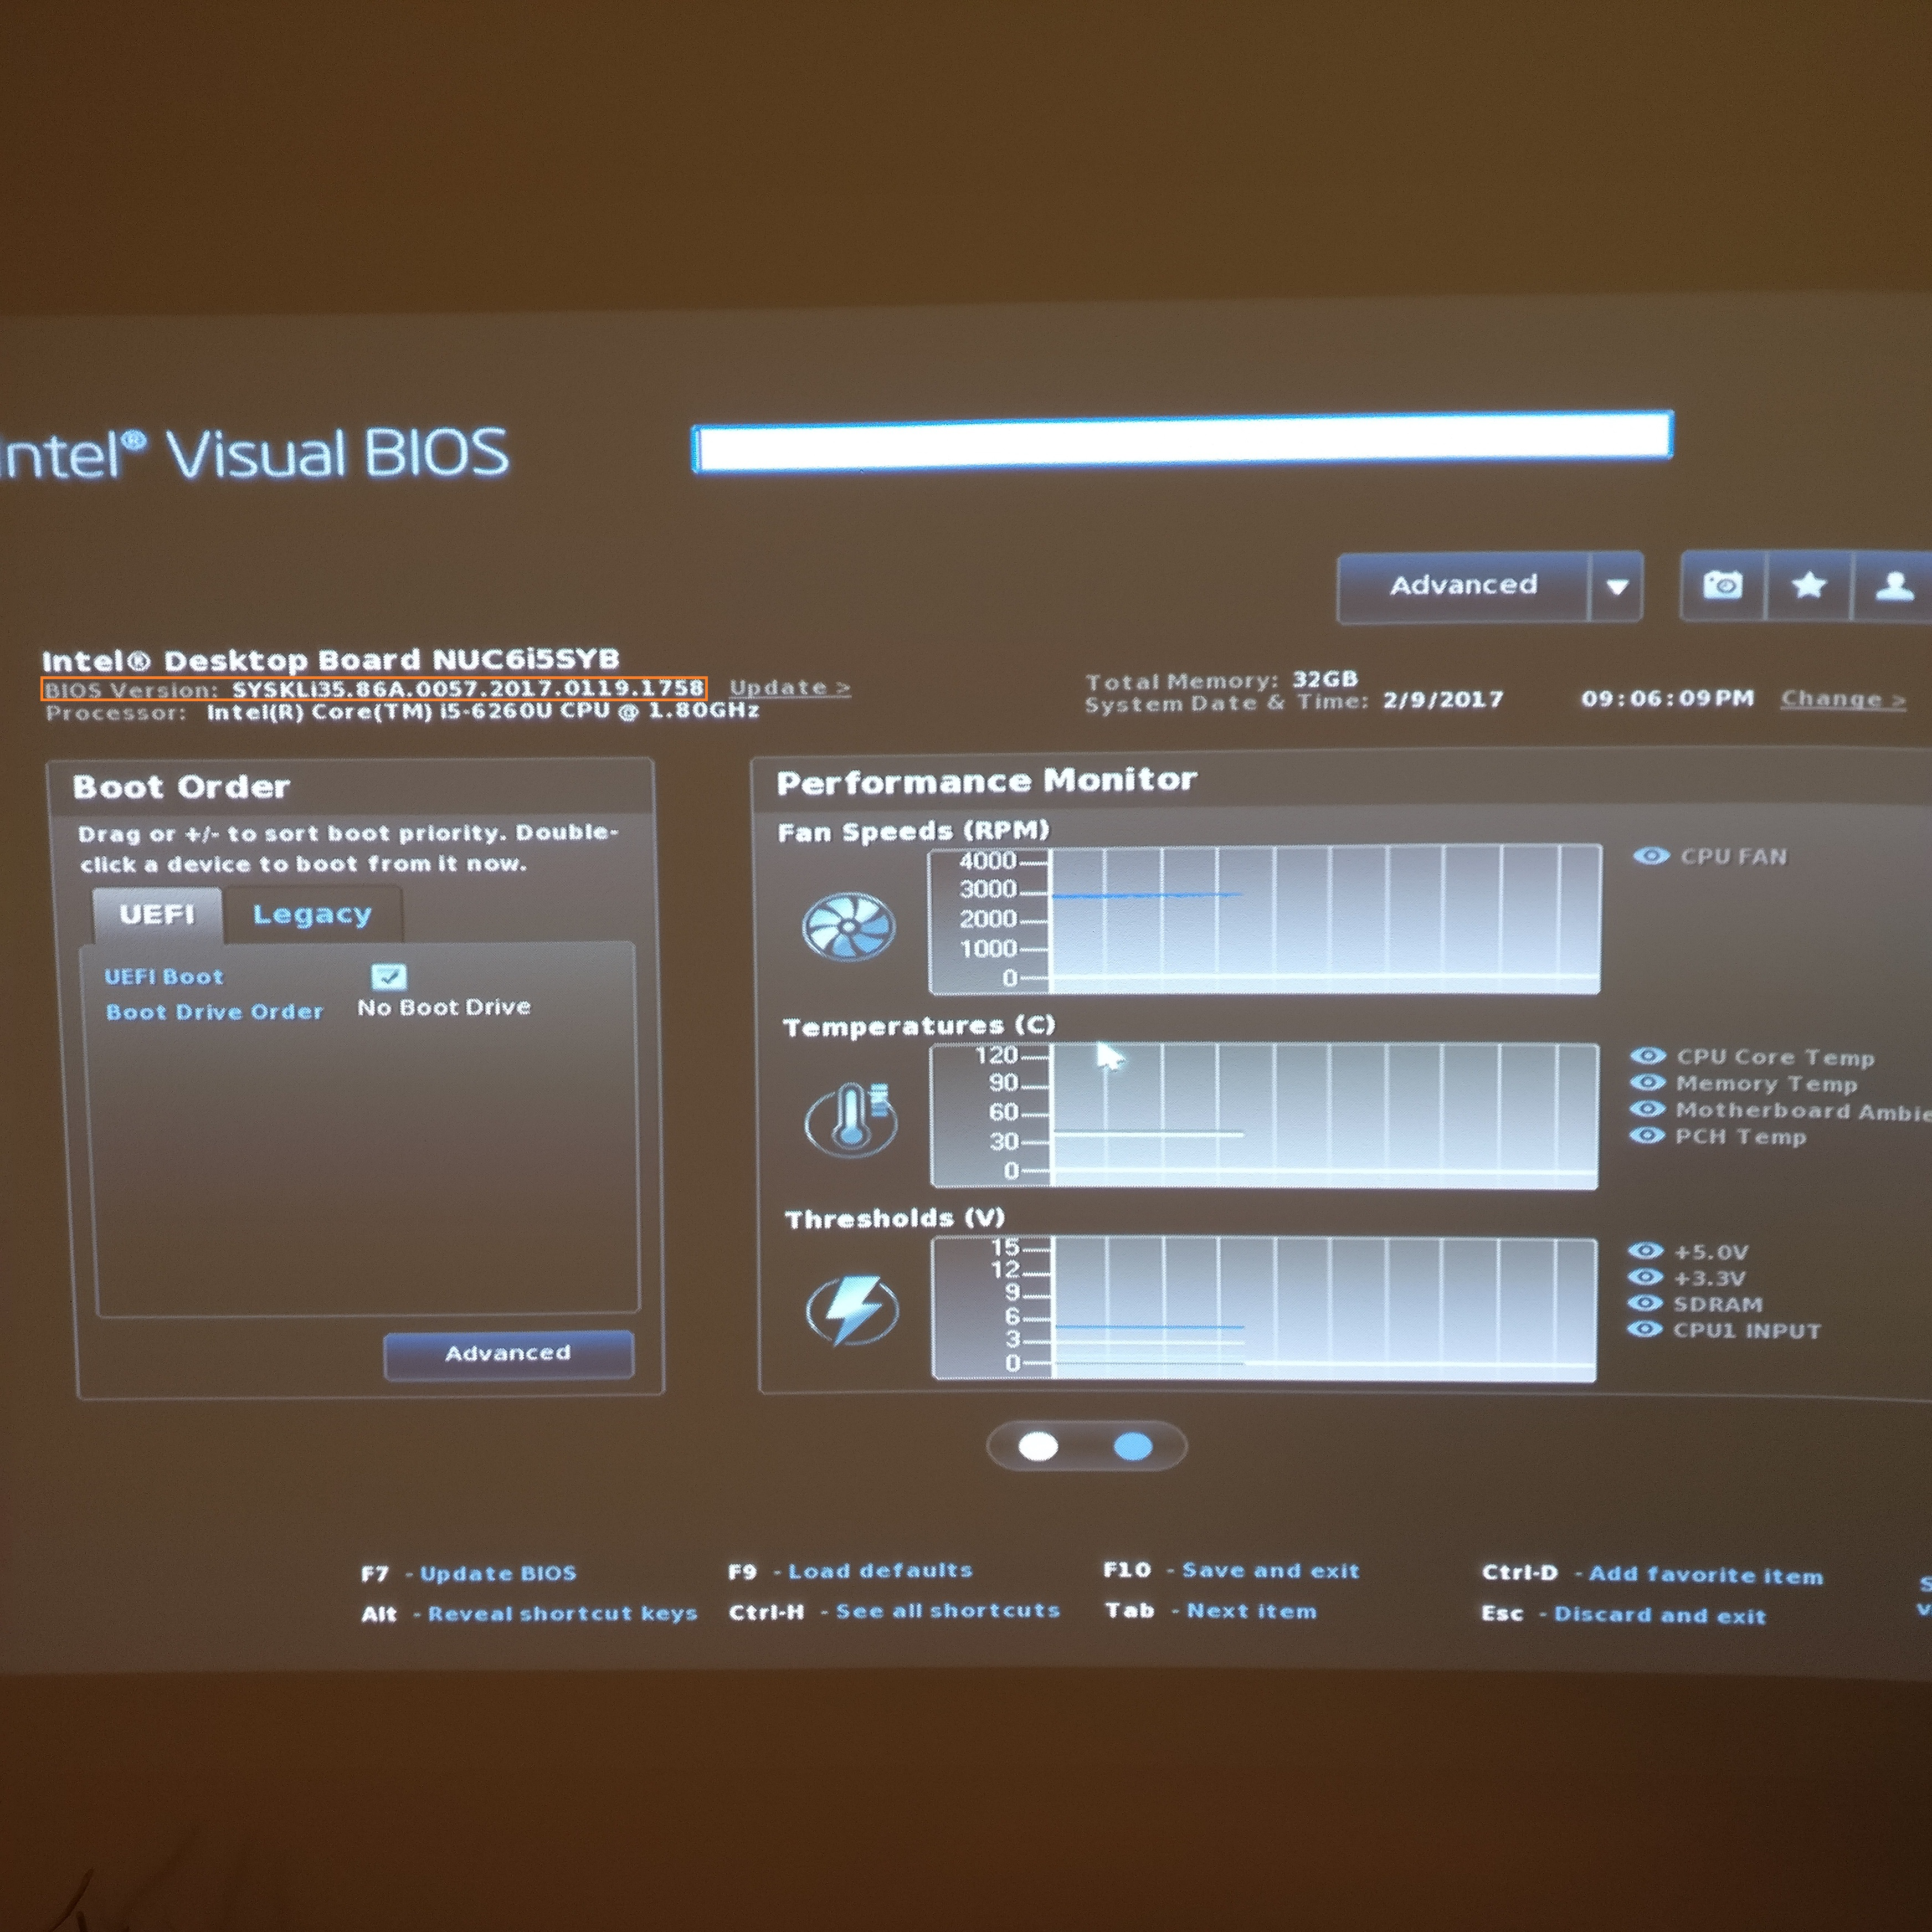 domalab.com Intel NUC BIOS update